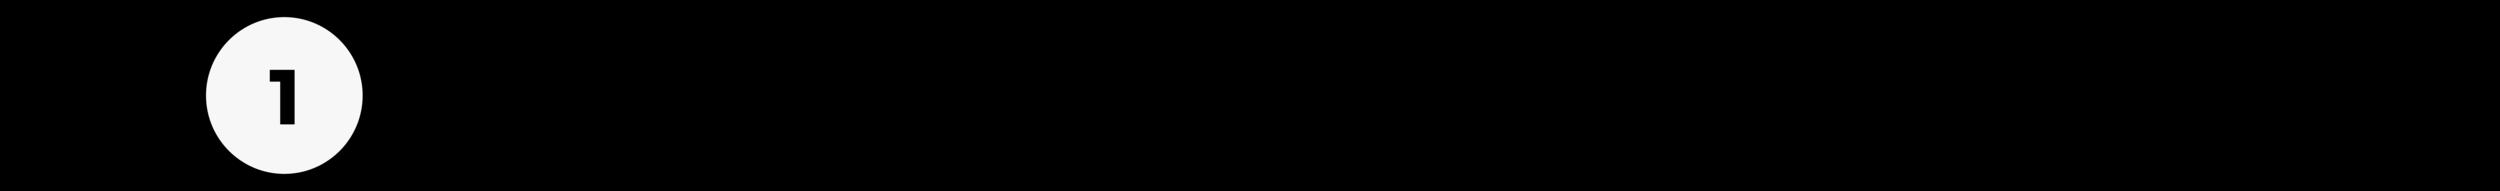 LineBreak 01 (1).png